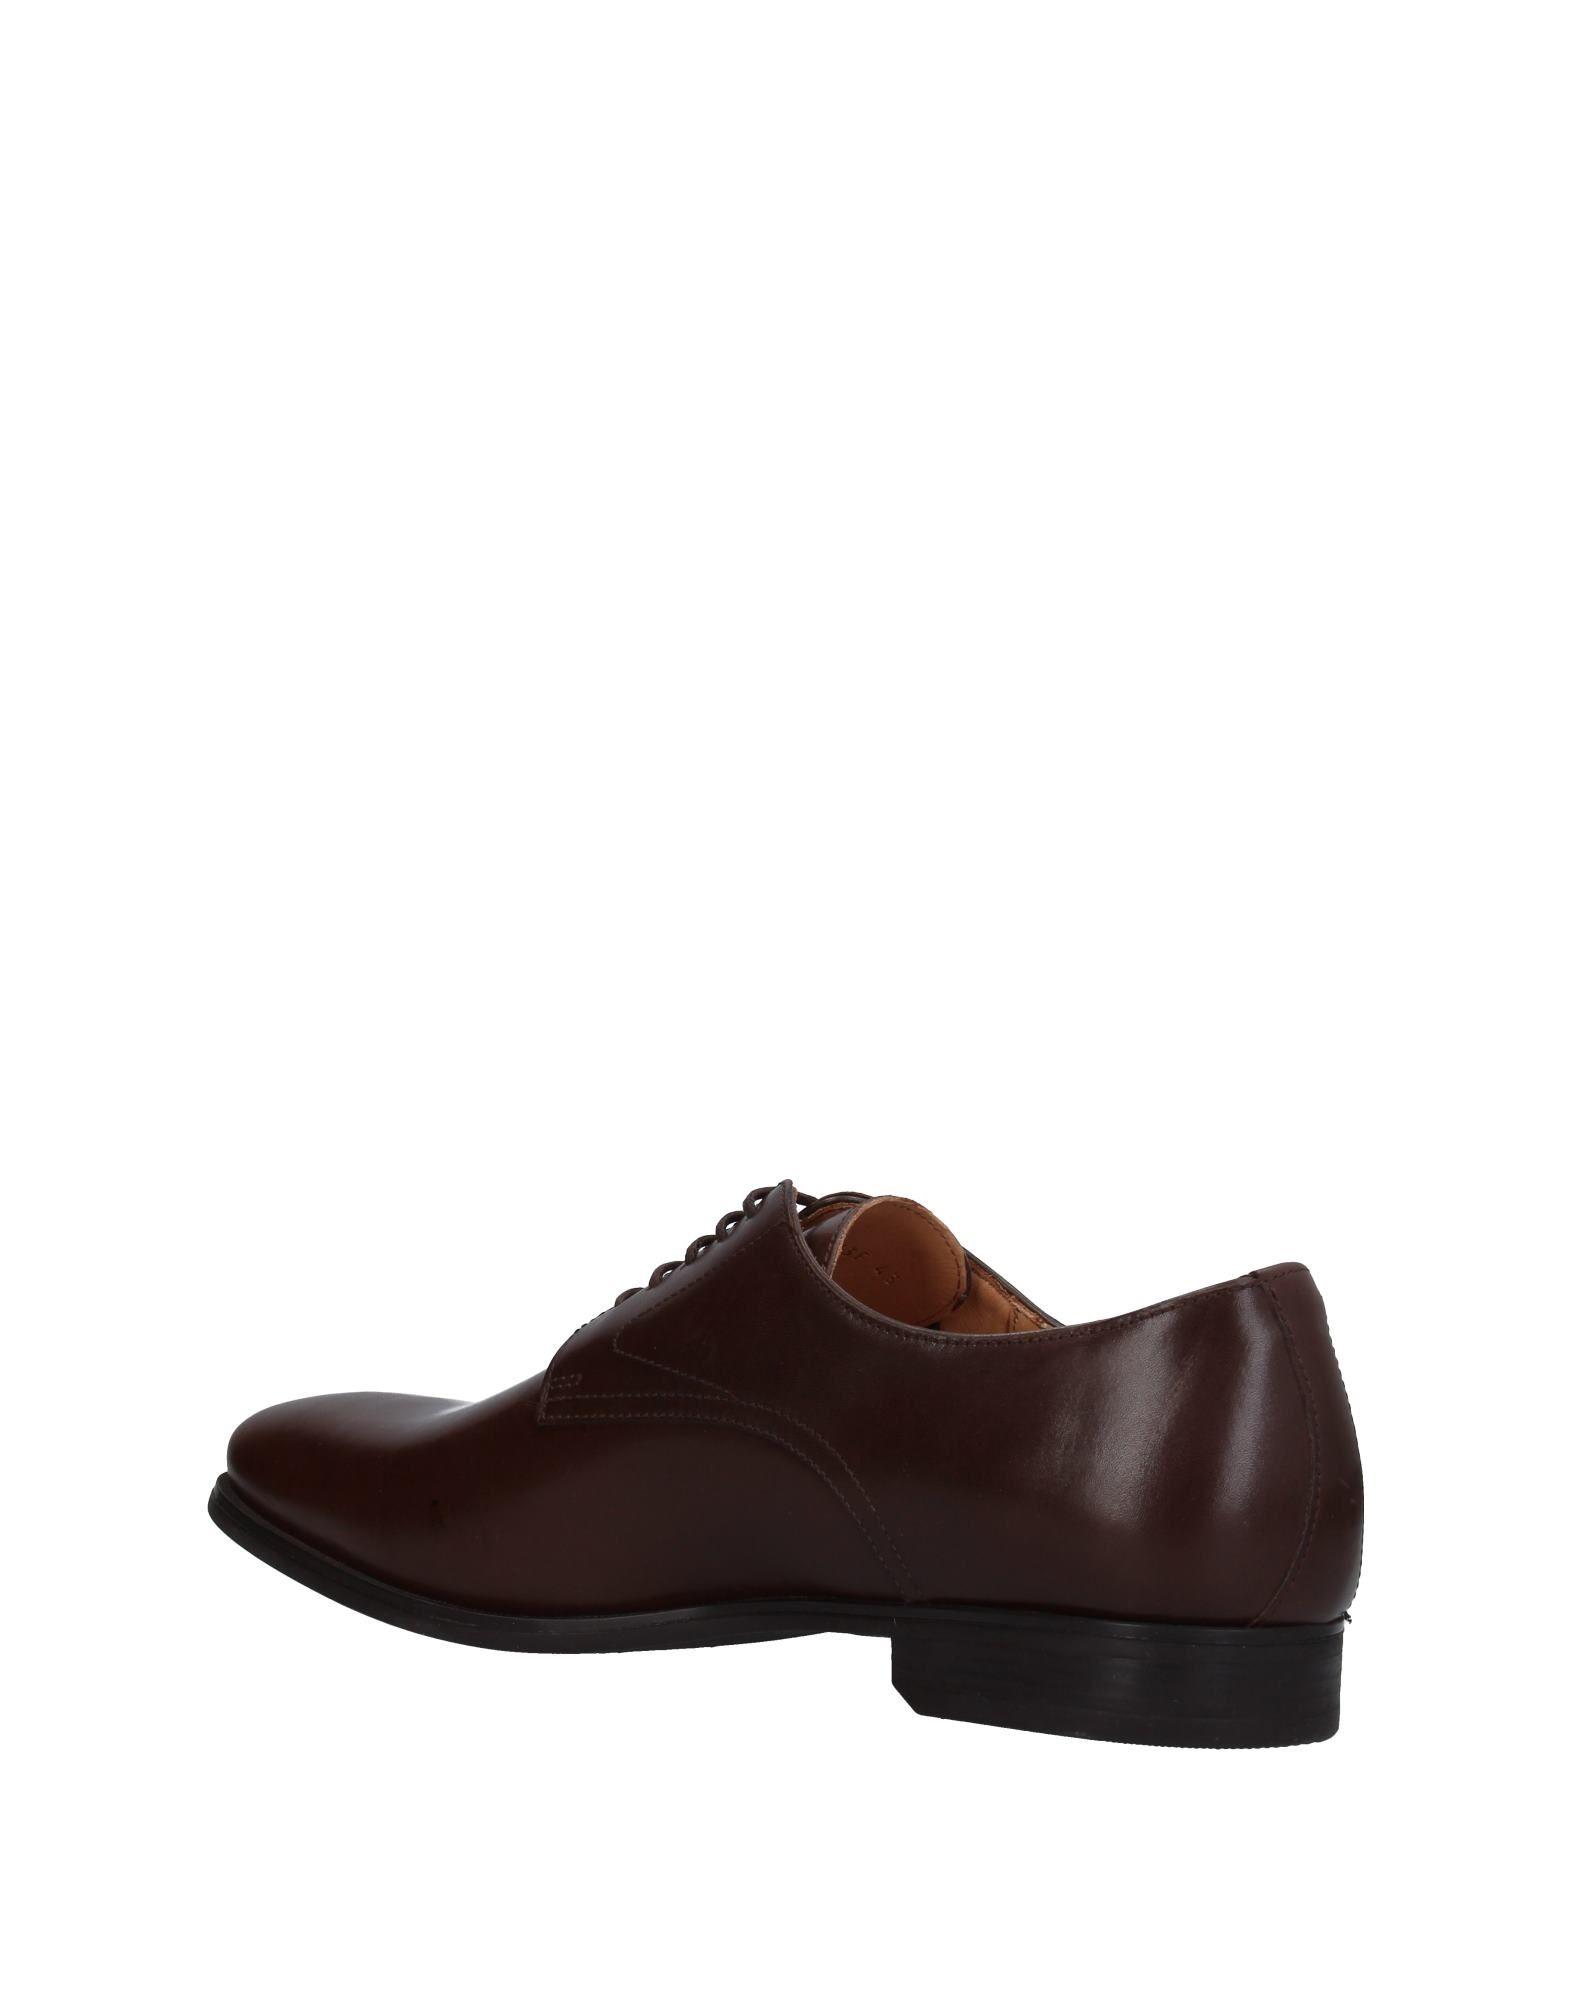 CHAUSSURES - BottinesOpenClosedShoes 9tNNE